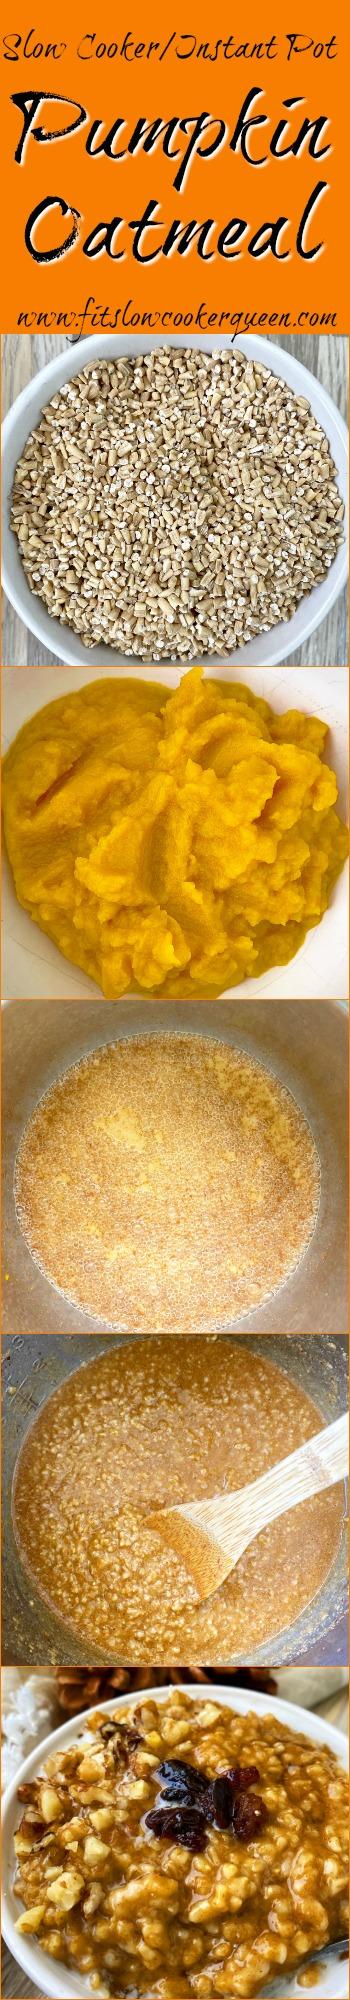 another pinterest pin for Slow Cooker_Instant Pot Pumpkin Oatmeal (Vegan)